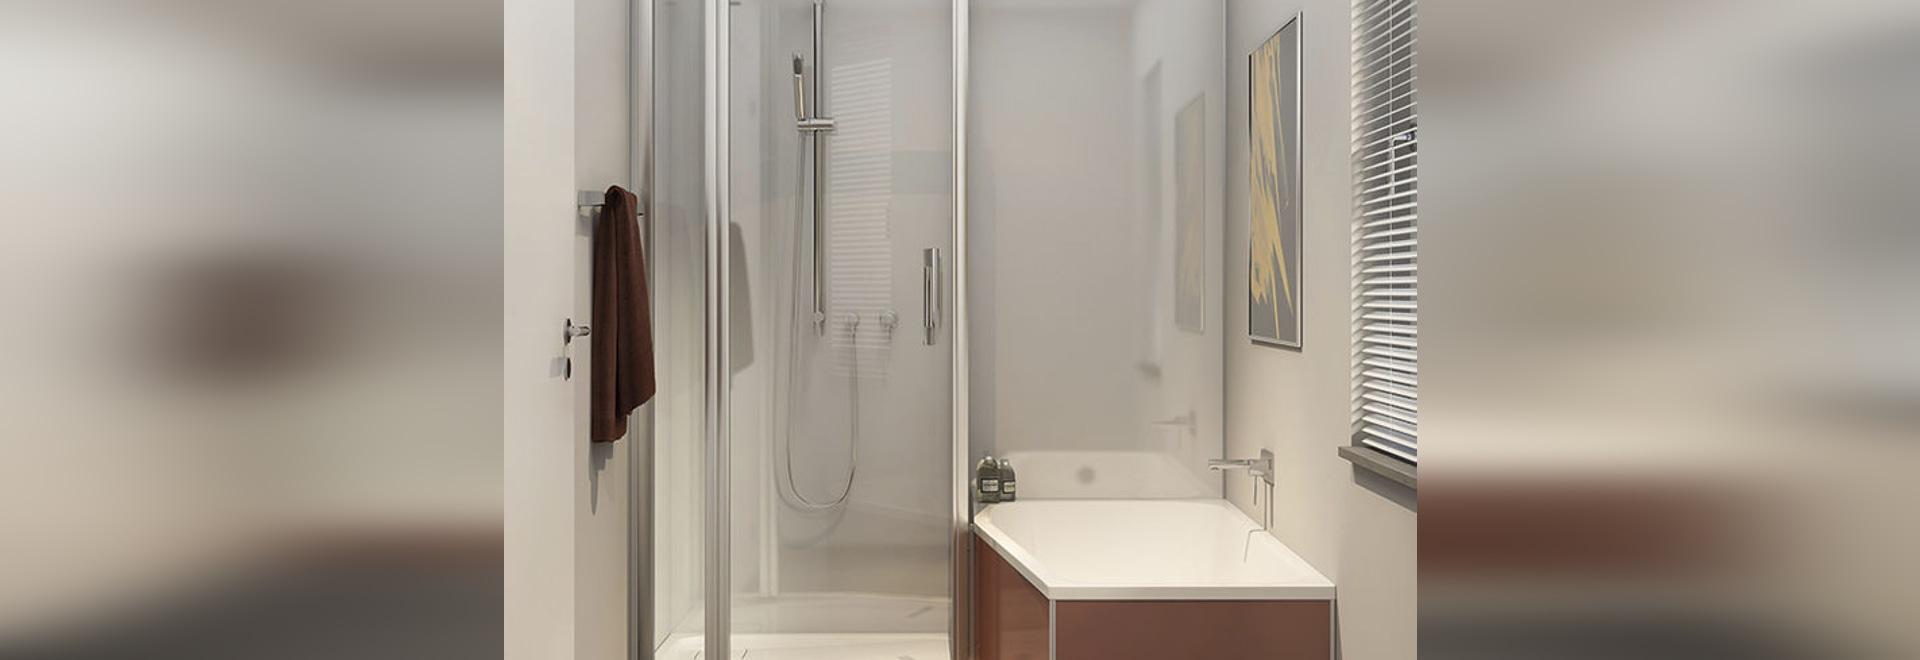 NOVITÀ: vasca da bagno doccia da incasso by DUSCHOLUX AG - DUSCHOLUX AG